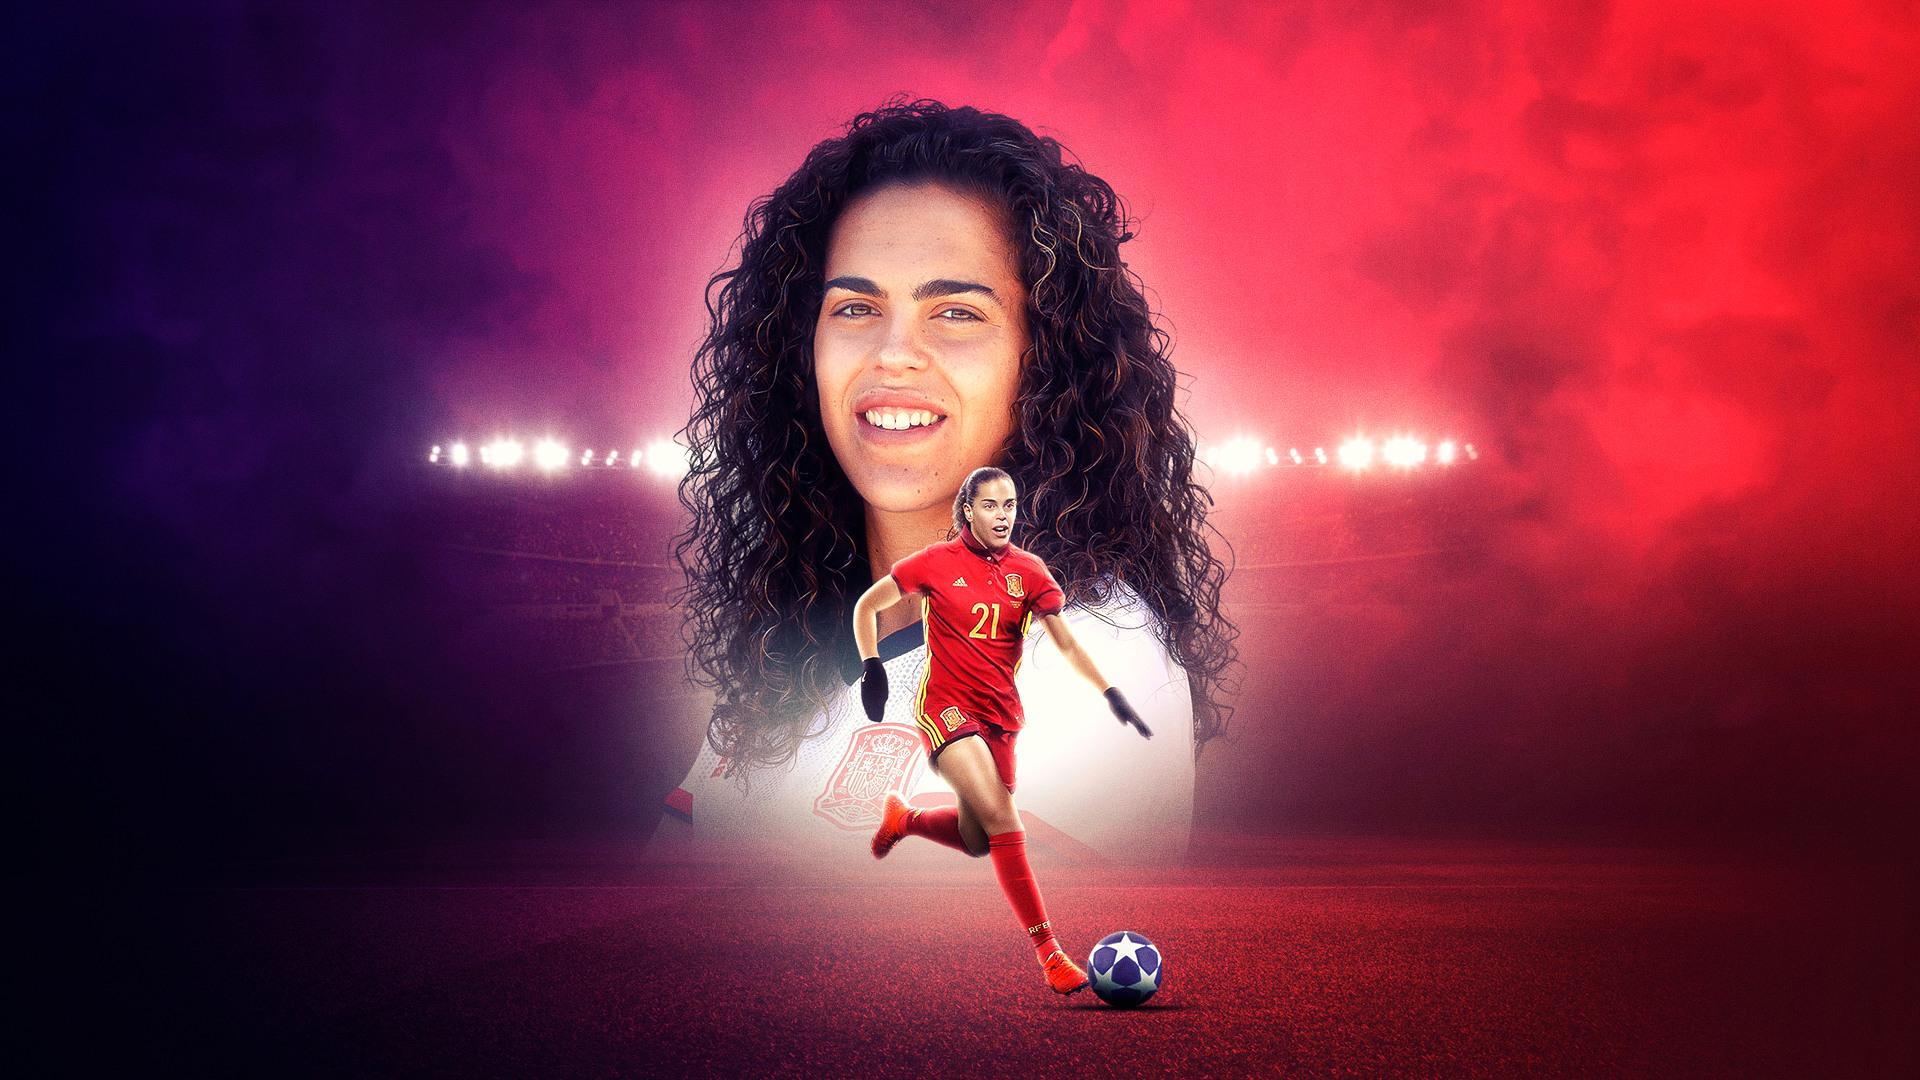 global sport talent gst valencia fútbol femenino futfem